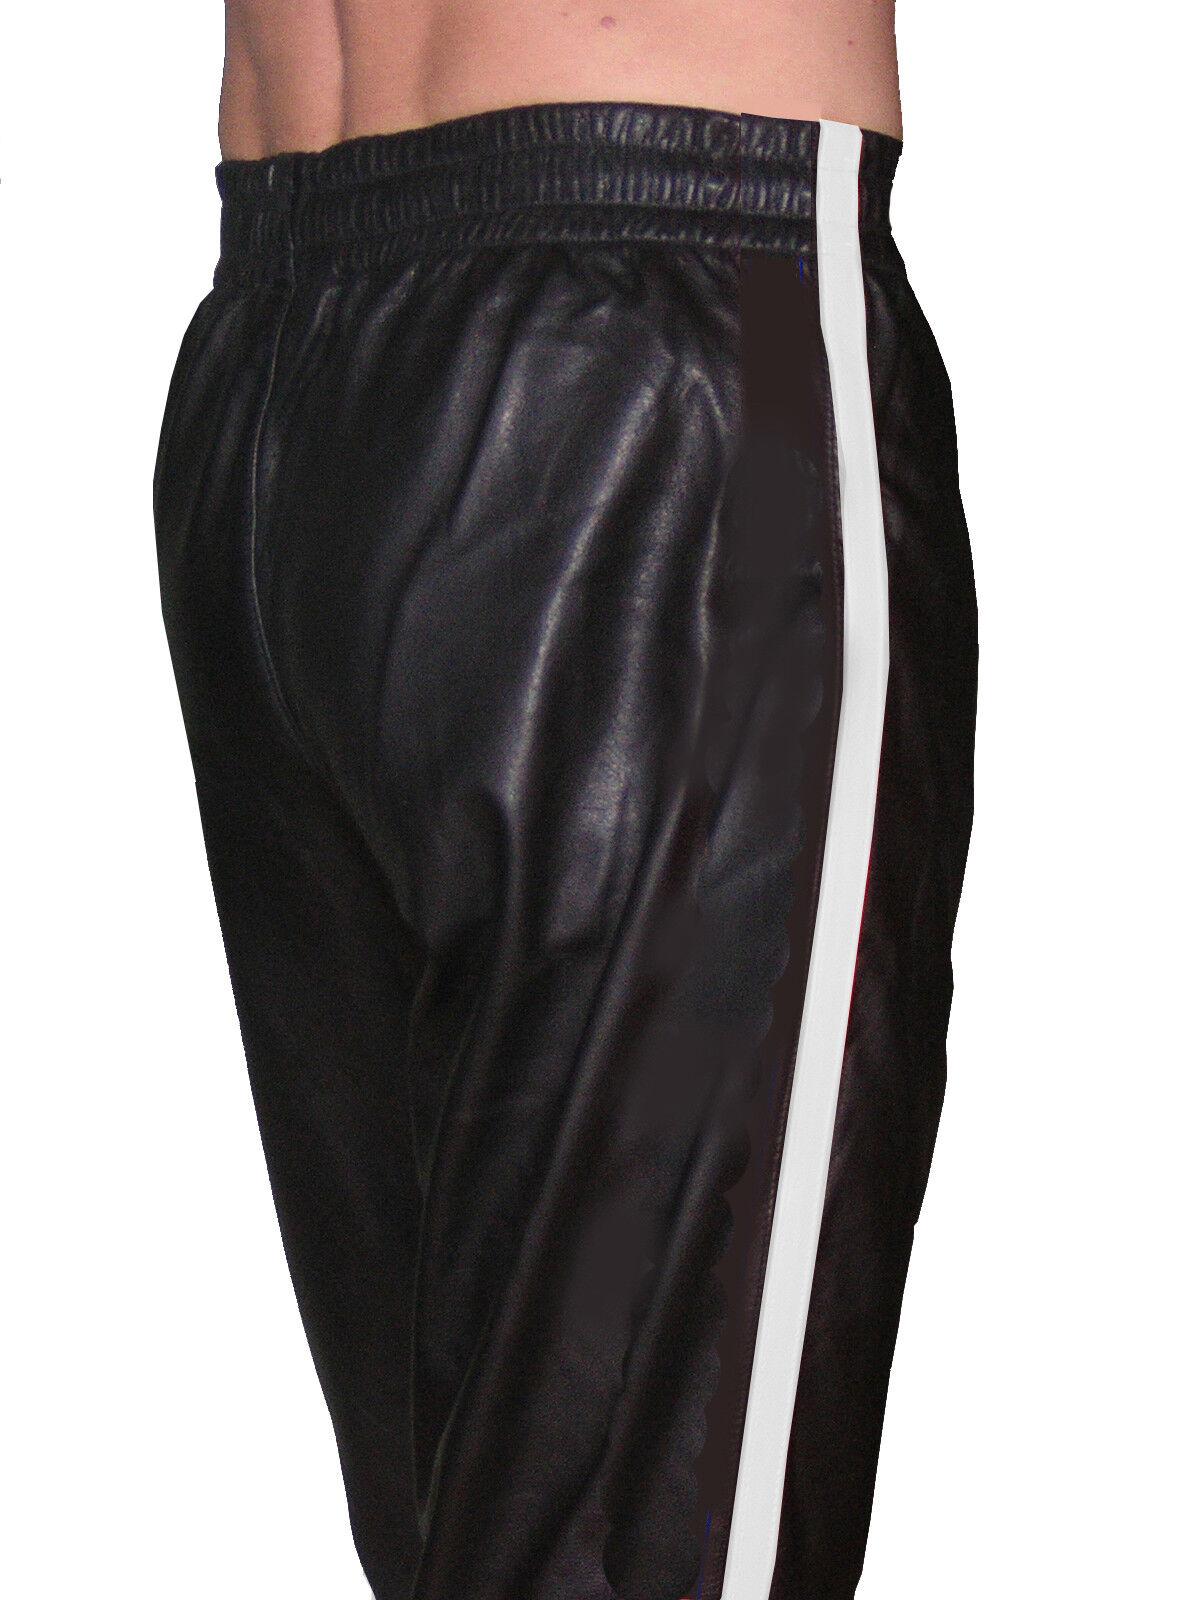 Sporthose schwarz weiß Lederhose Jogginghose neu casual sport sport sport leather pants | Kaufen Sie online  | 2019  852e87